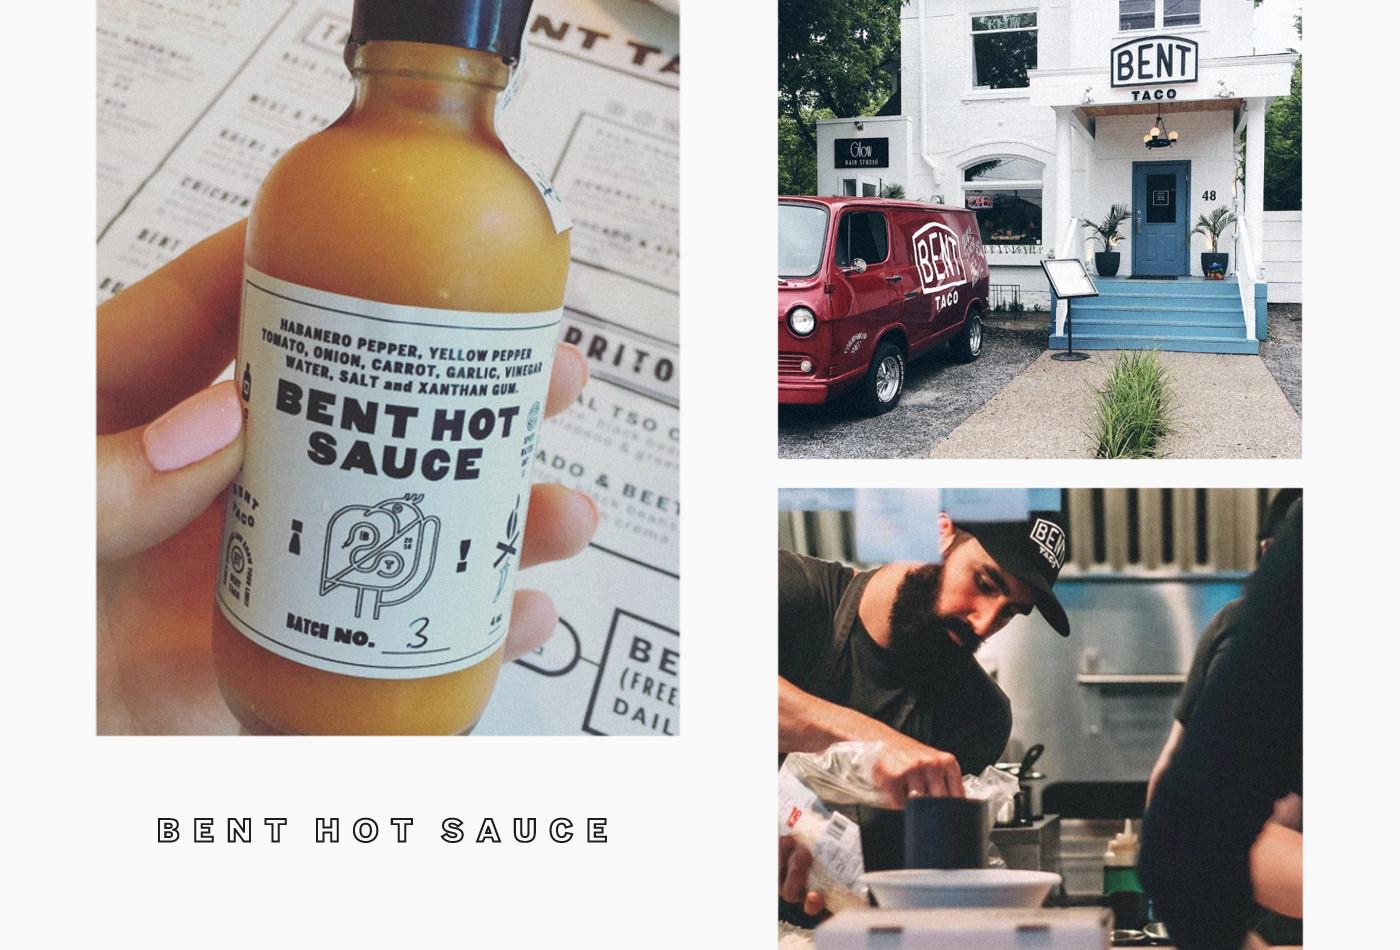 benttaco-sauce-pepper-branding-brand-eagle-marks-vacaleibres-collingwood-ontario-mexican-restaurant